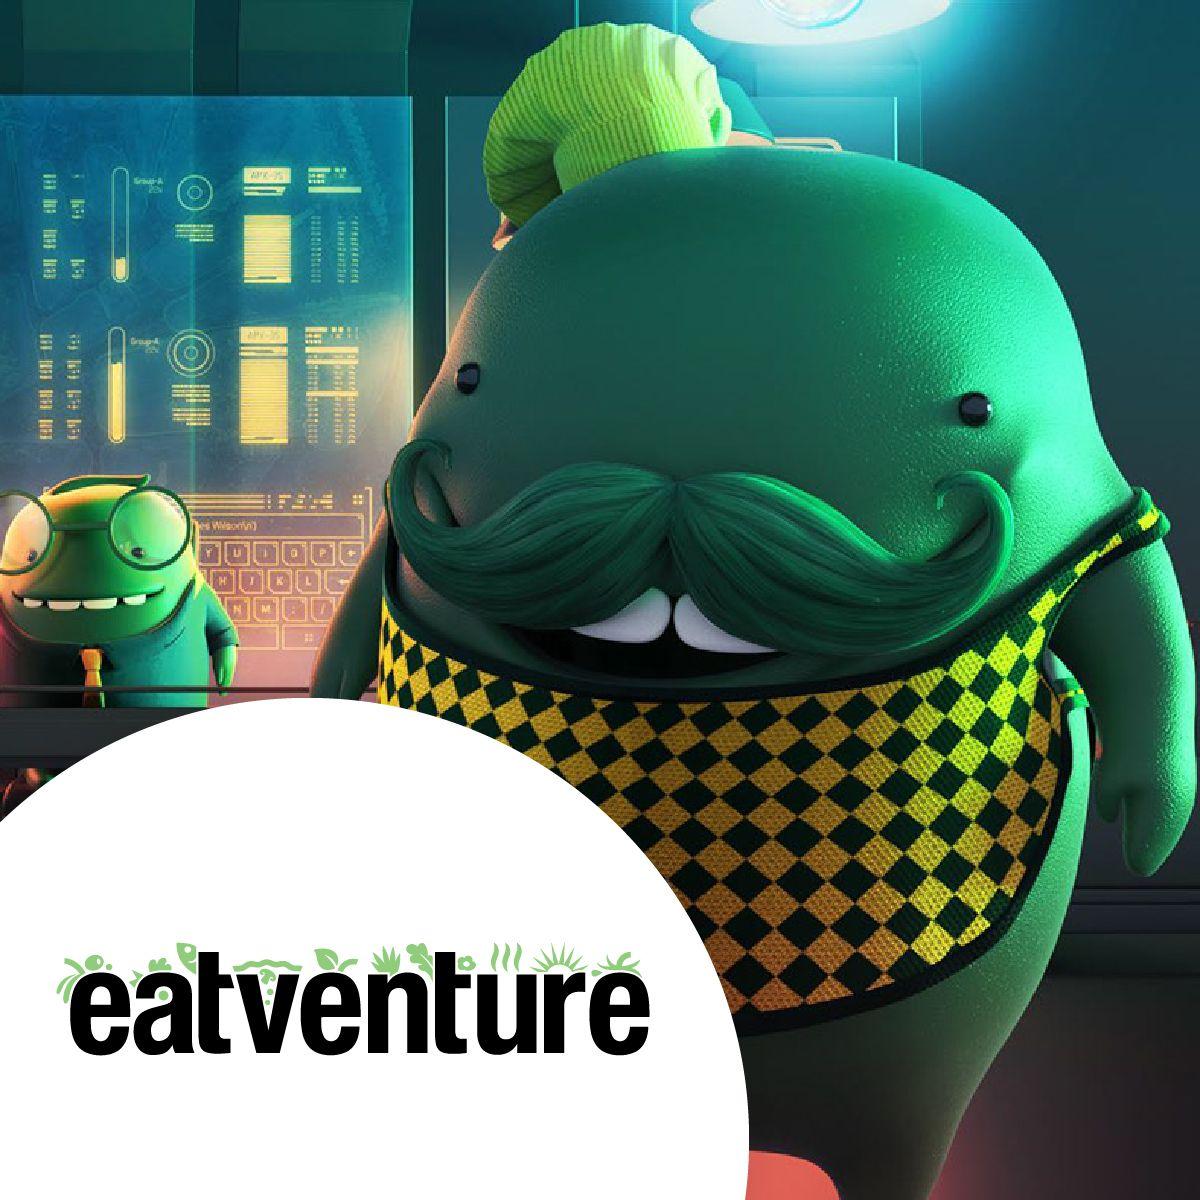 Eatventure